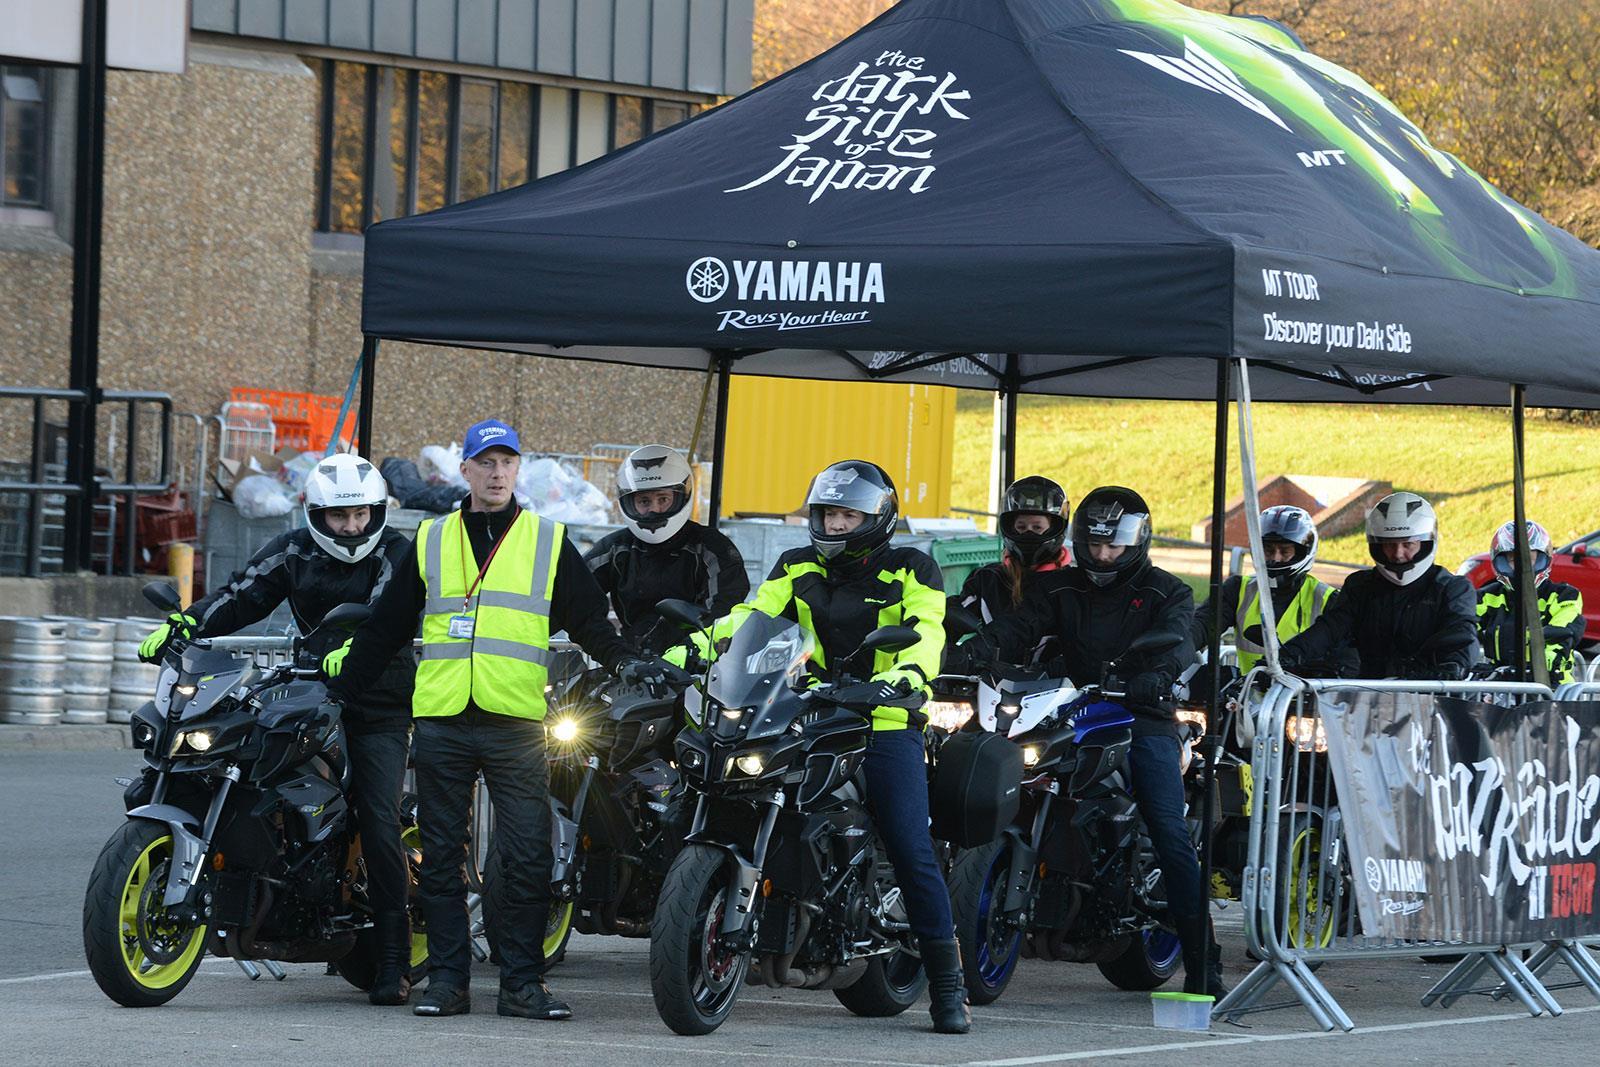 Yamaha Darkside MT tour